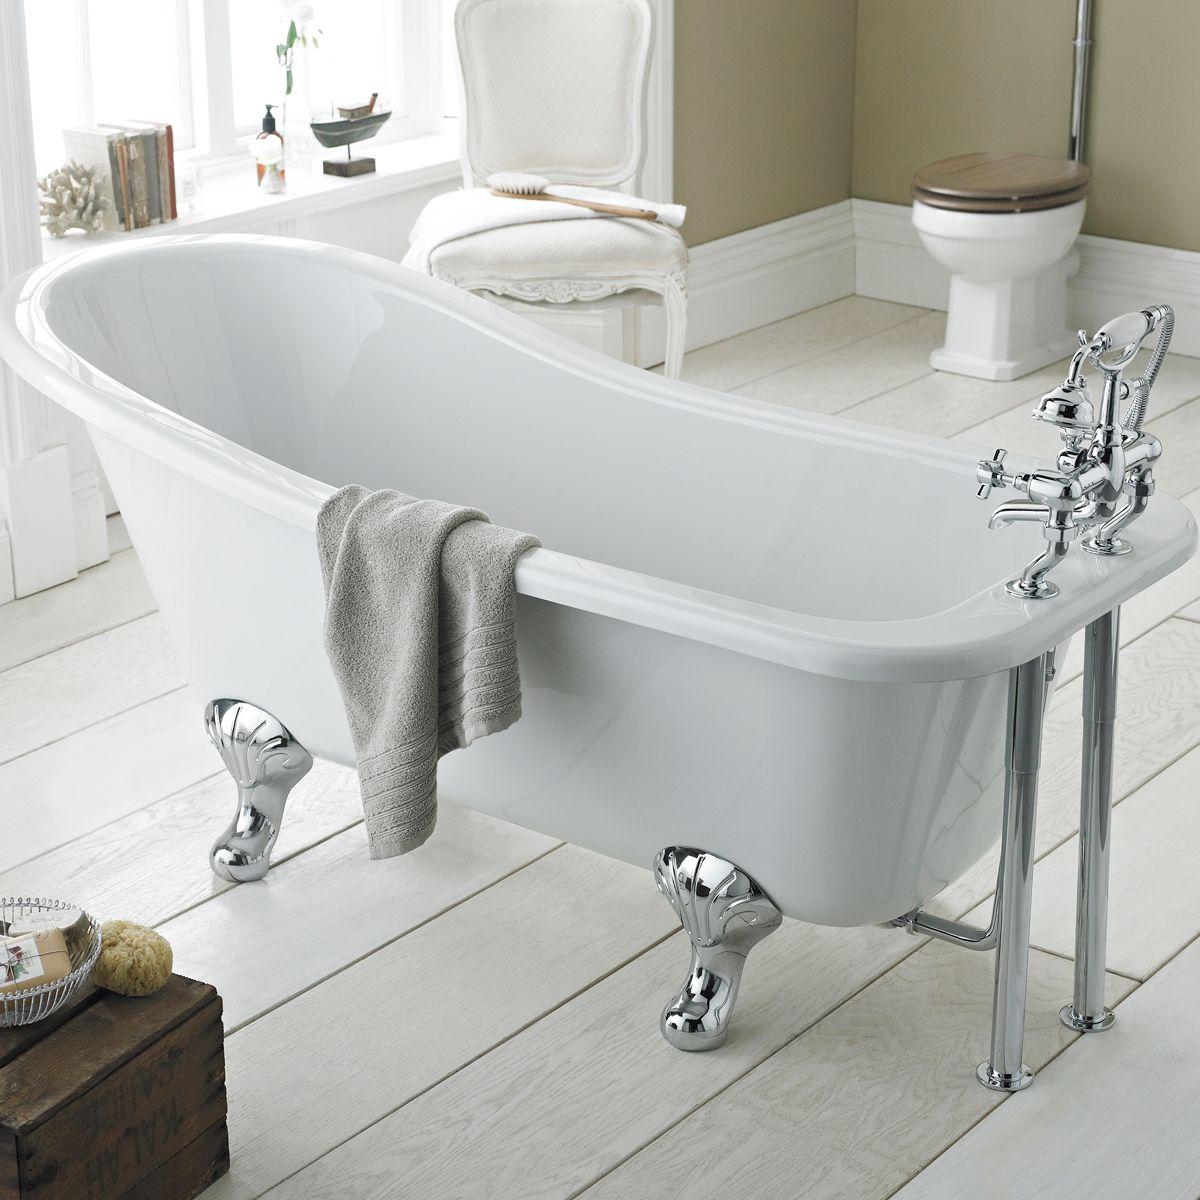 Hudson Reed Kensington Freestanding Slipper Bath with Leg Set